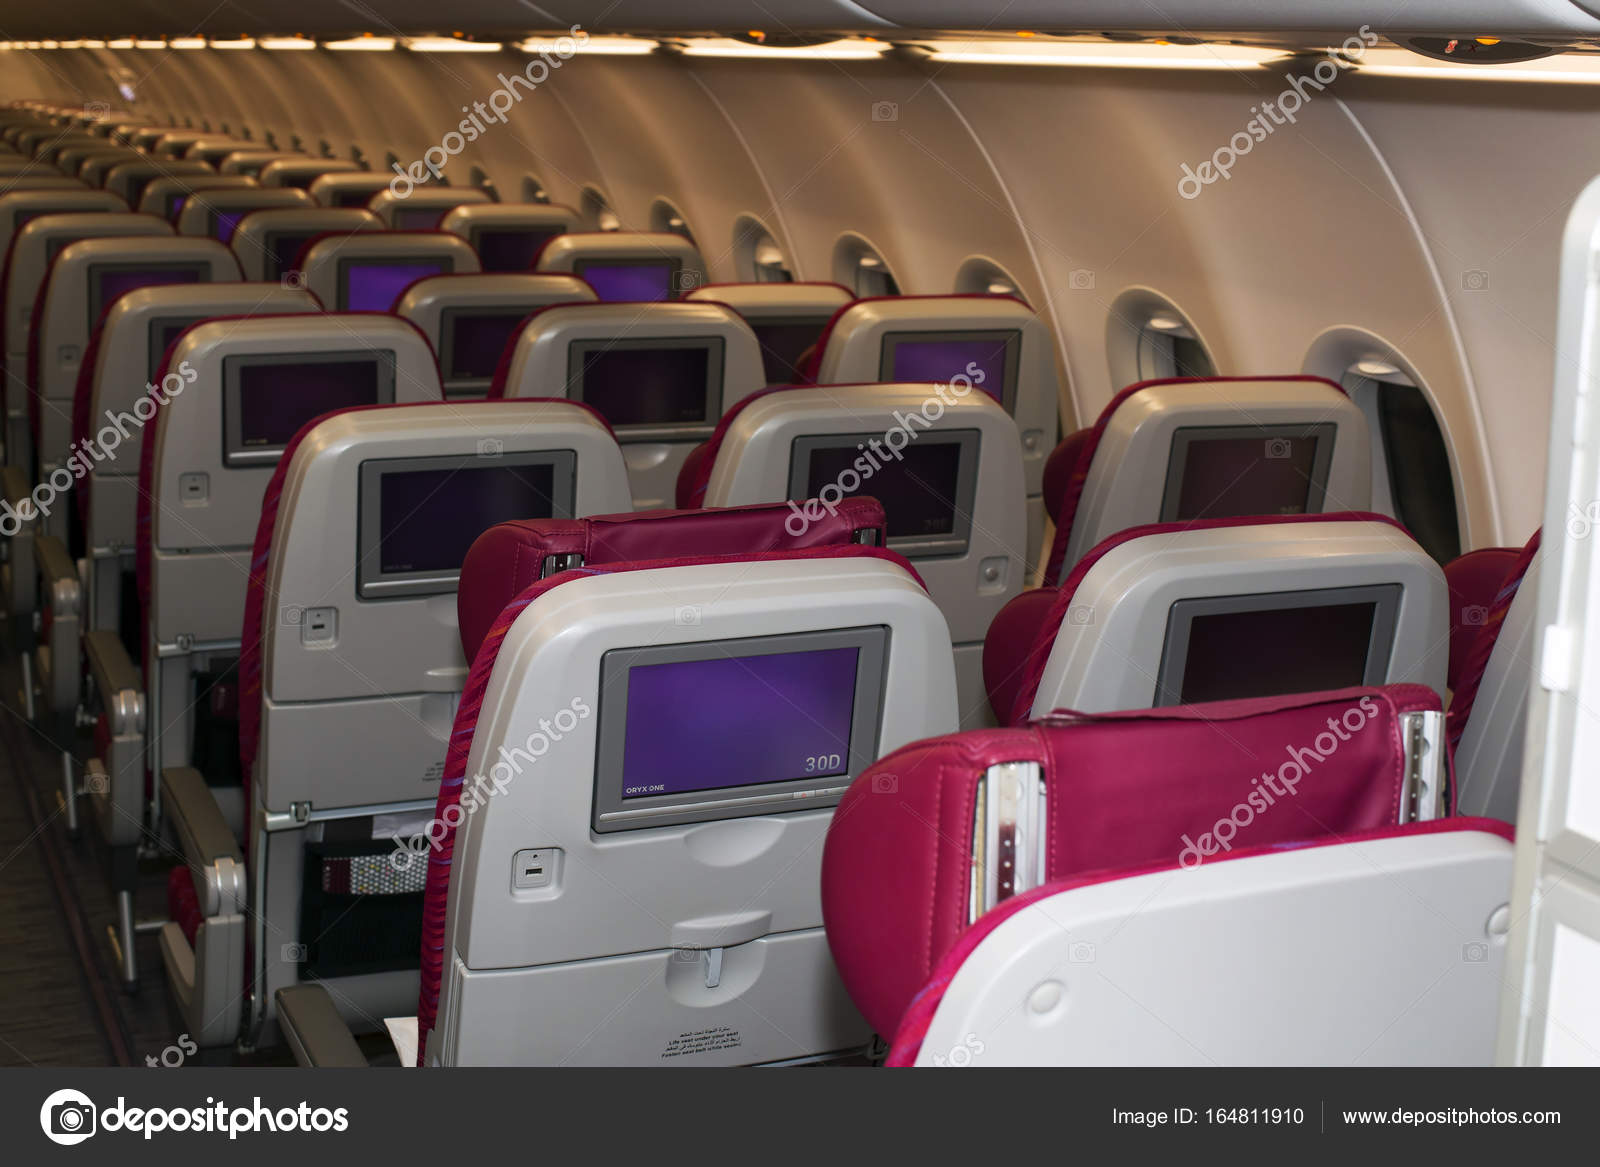 Qatar Airways Airbus A320 economy class seats — Stock Photo